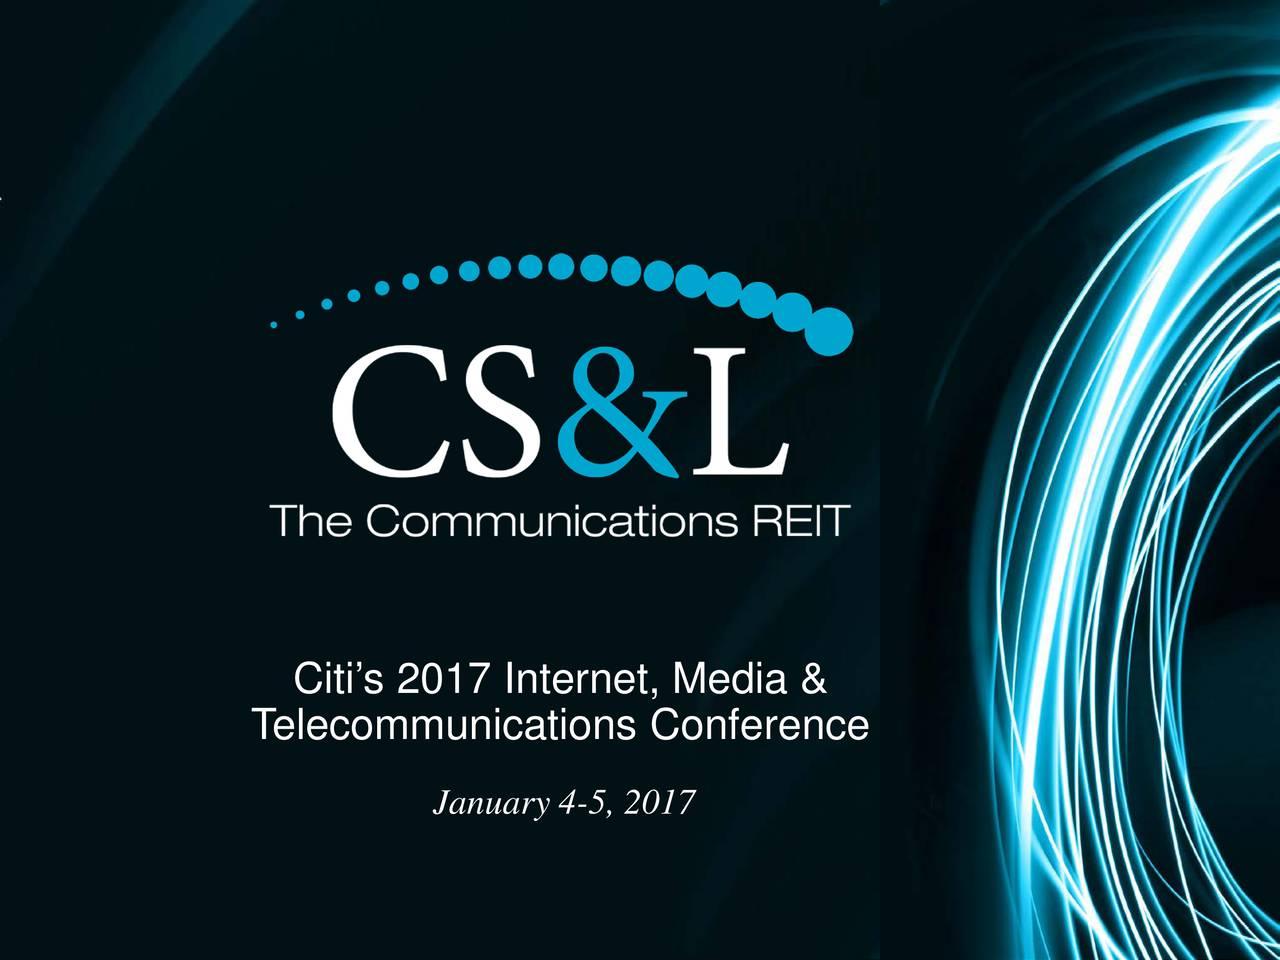 Telecommunications Conference January 4-5, 2017